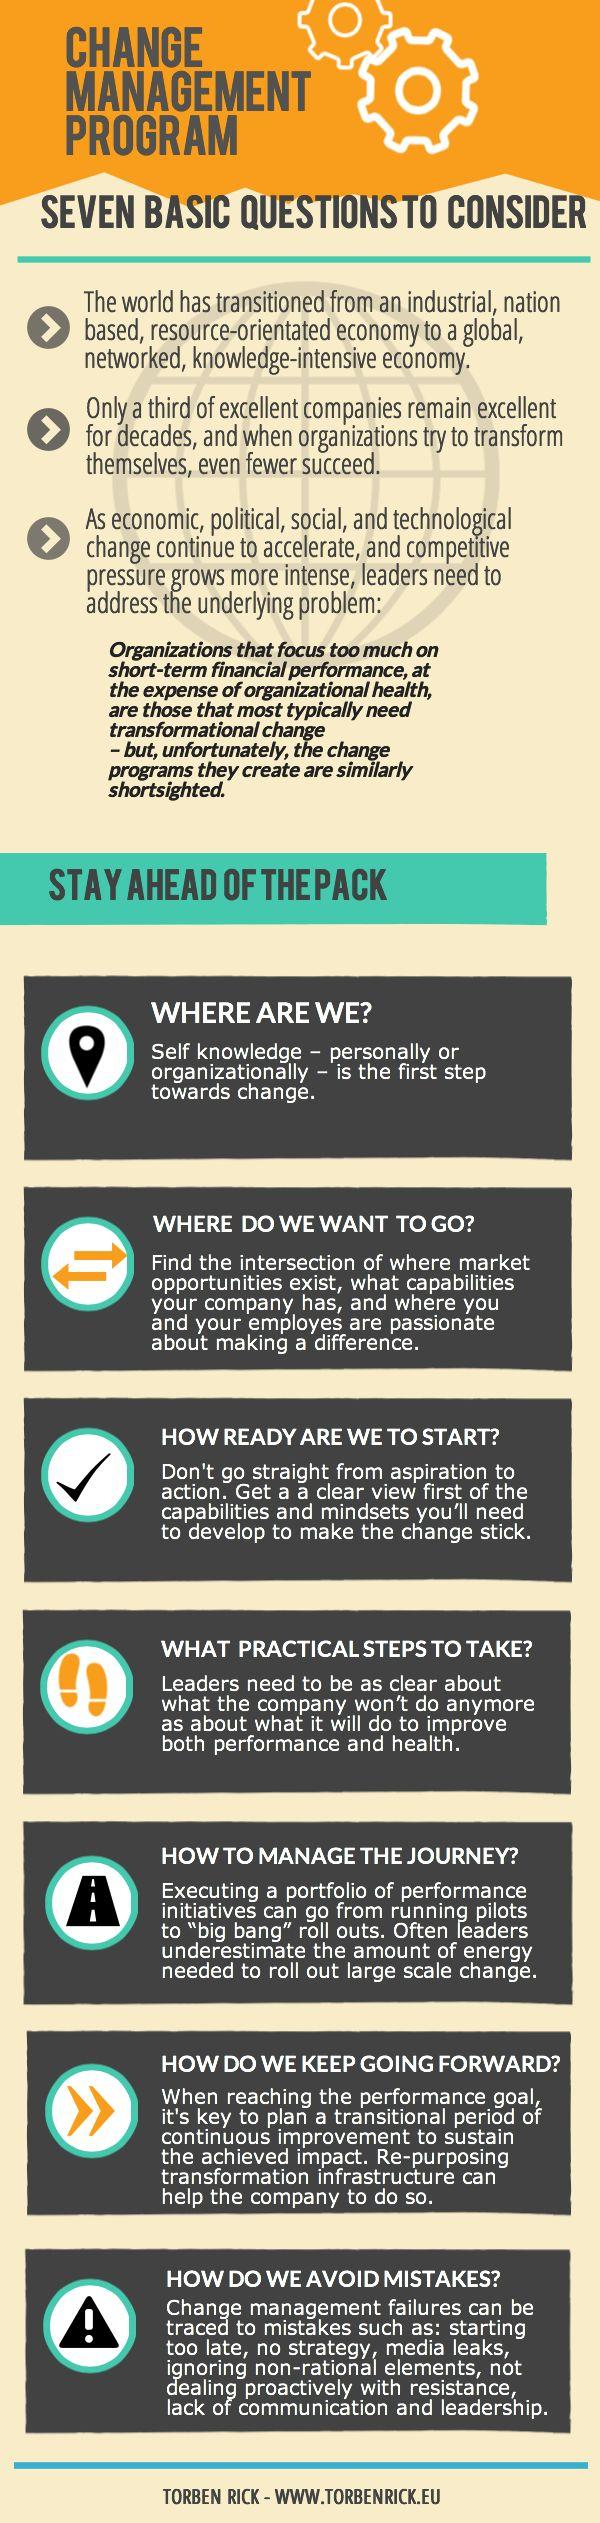 Business administration porfolio questions